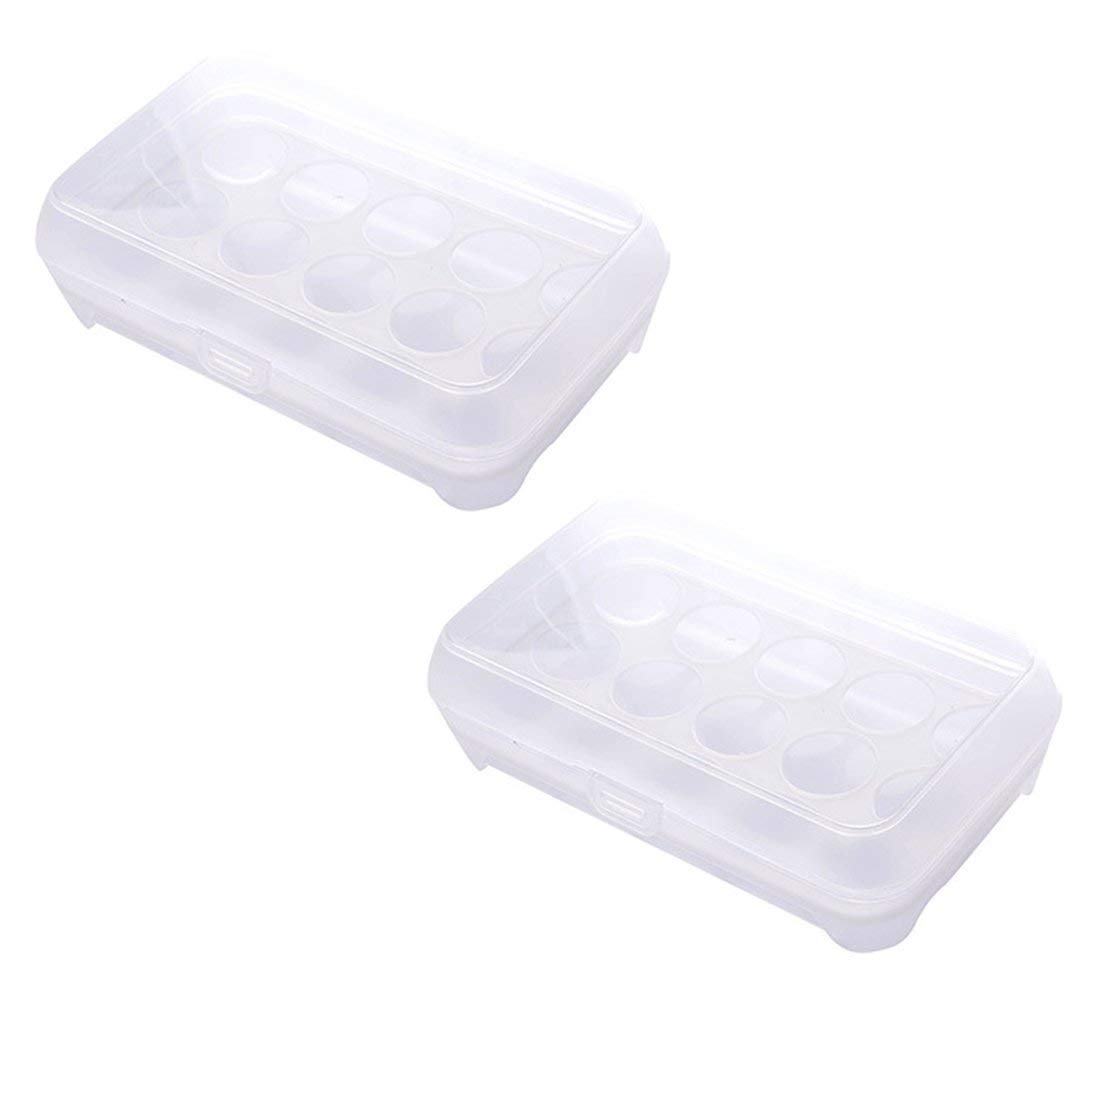 Cheap Reusable Egg Cartons Find Reusable Egg Cartons Deals On Line At Alibaba Com